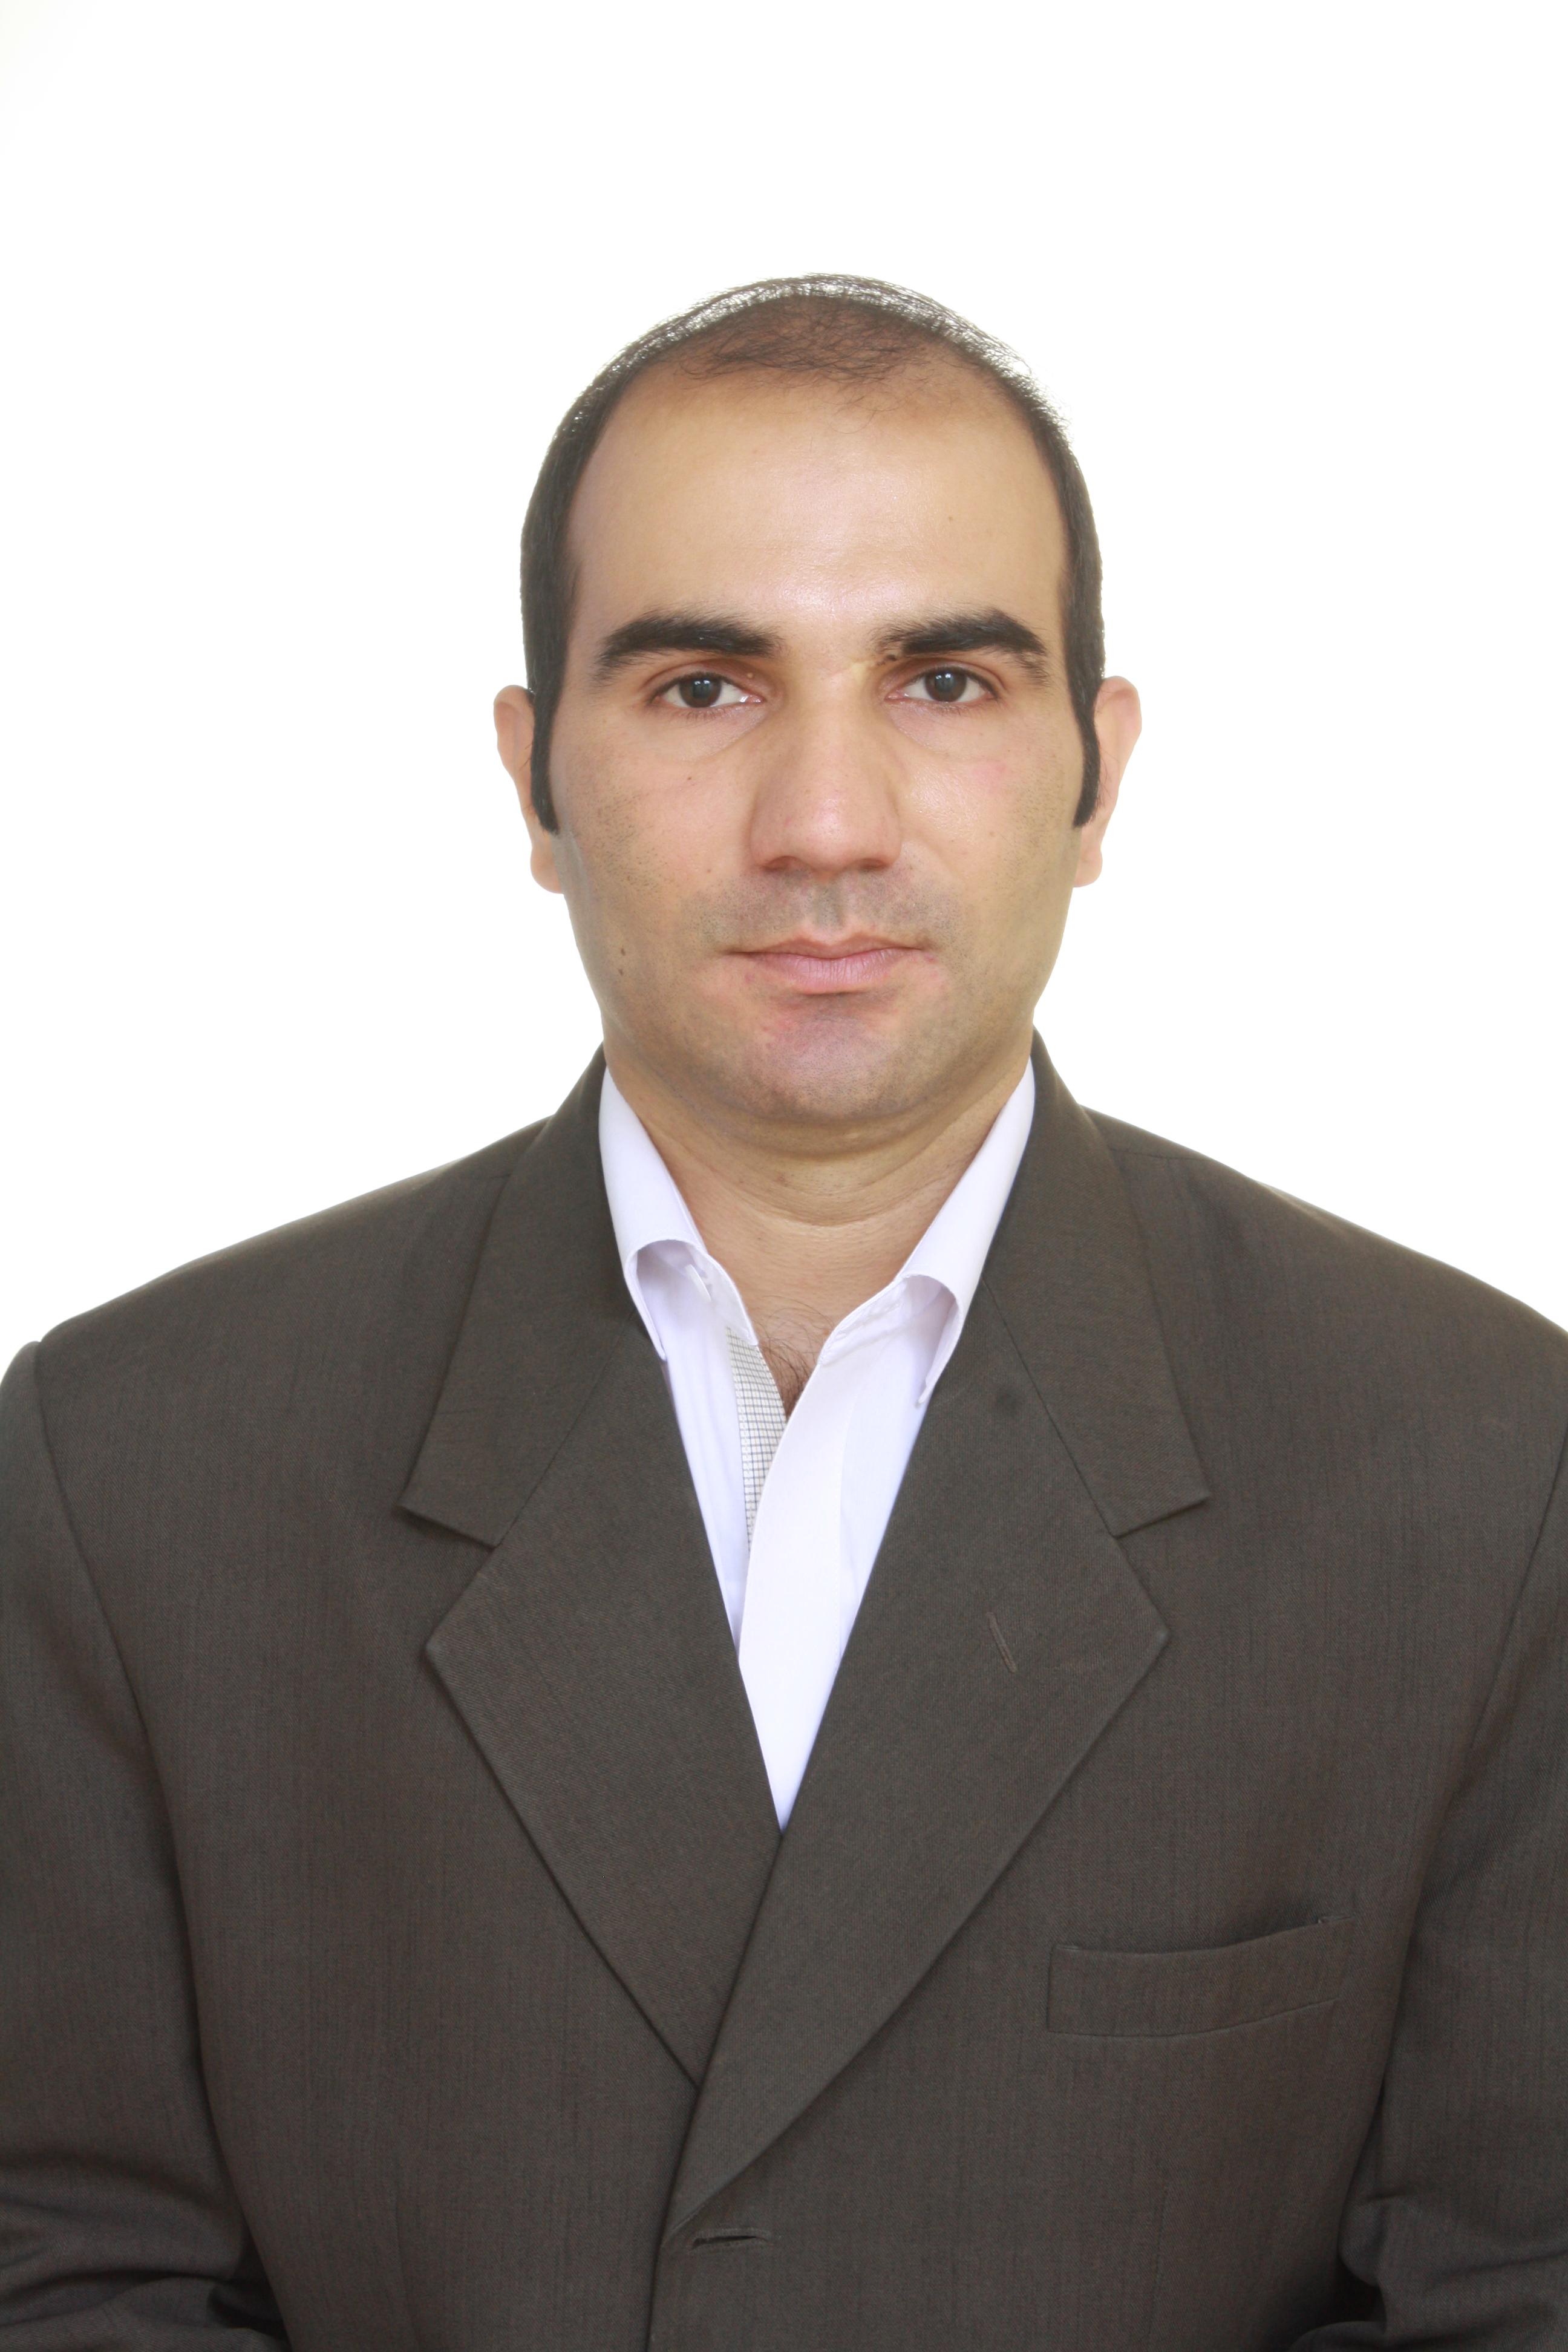 Tariq Kamal